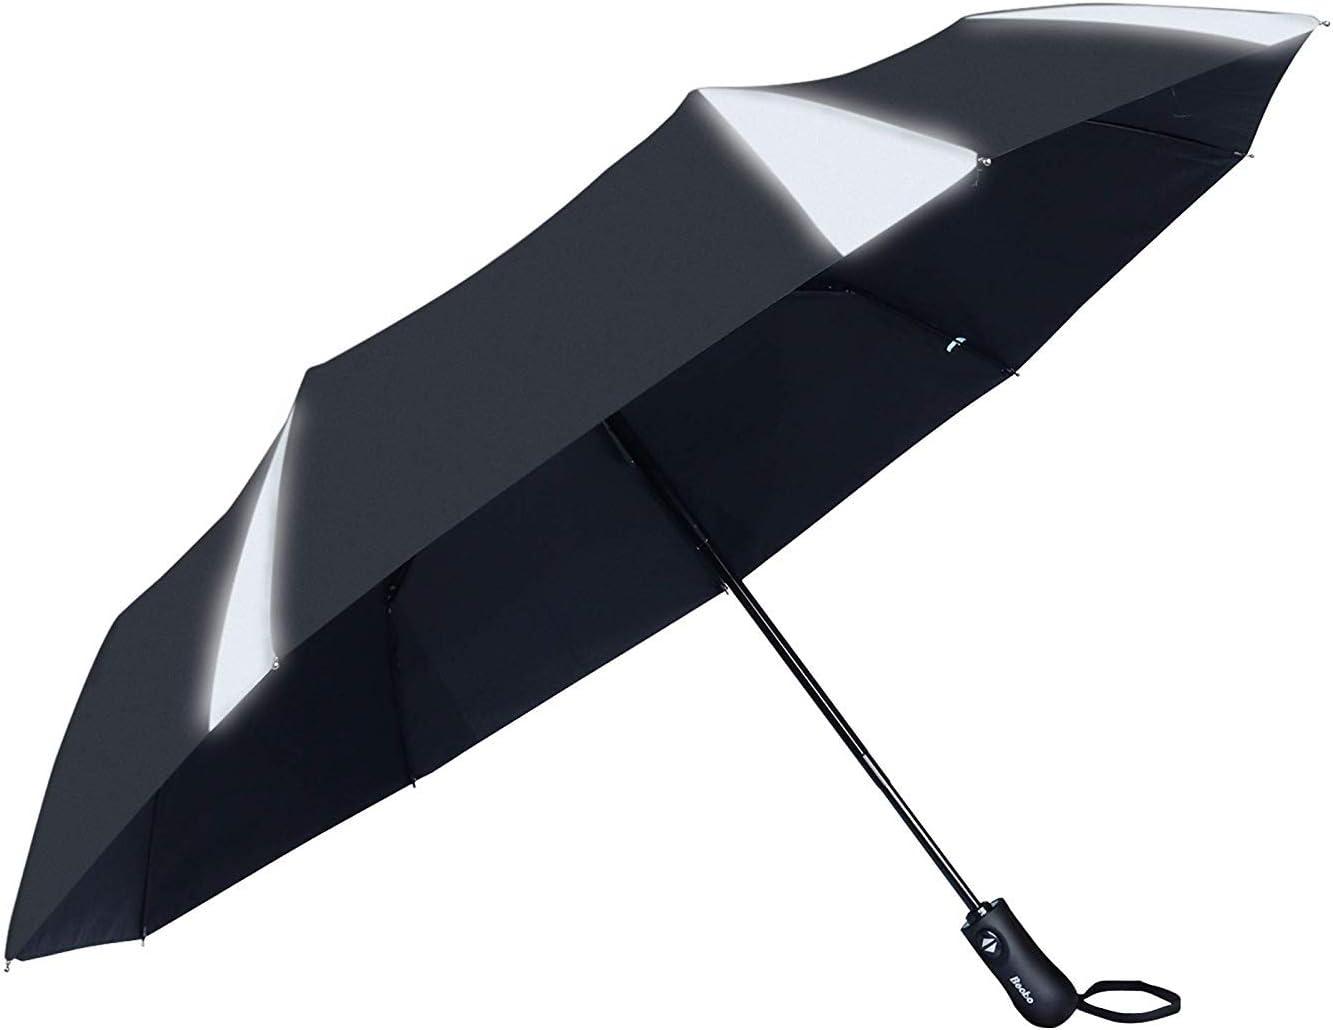 Black Becko 54 Inches Auto Open Umbrella Long Umbrella with 16 Ribs